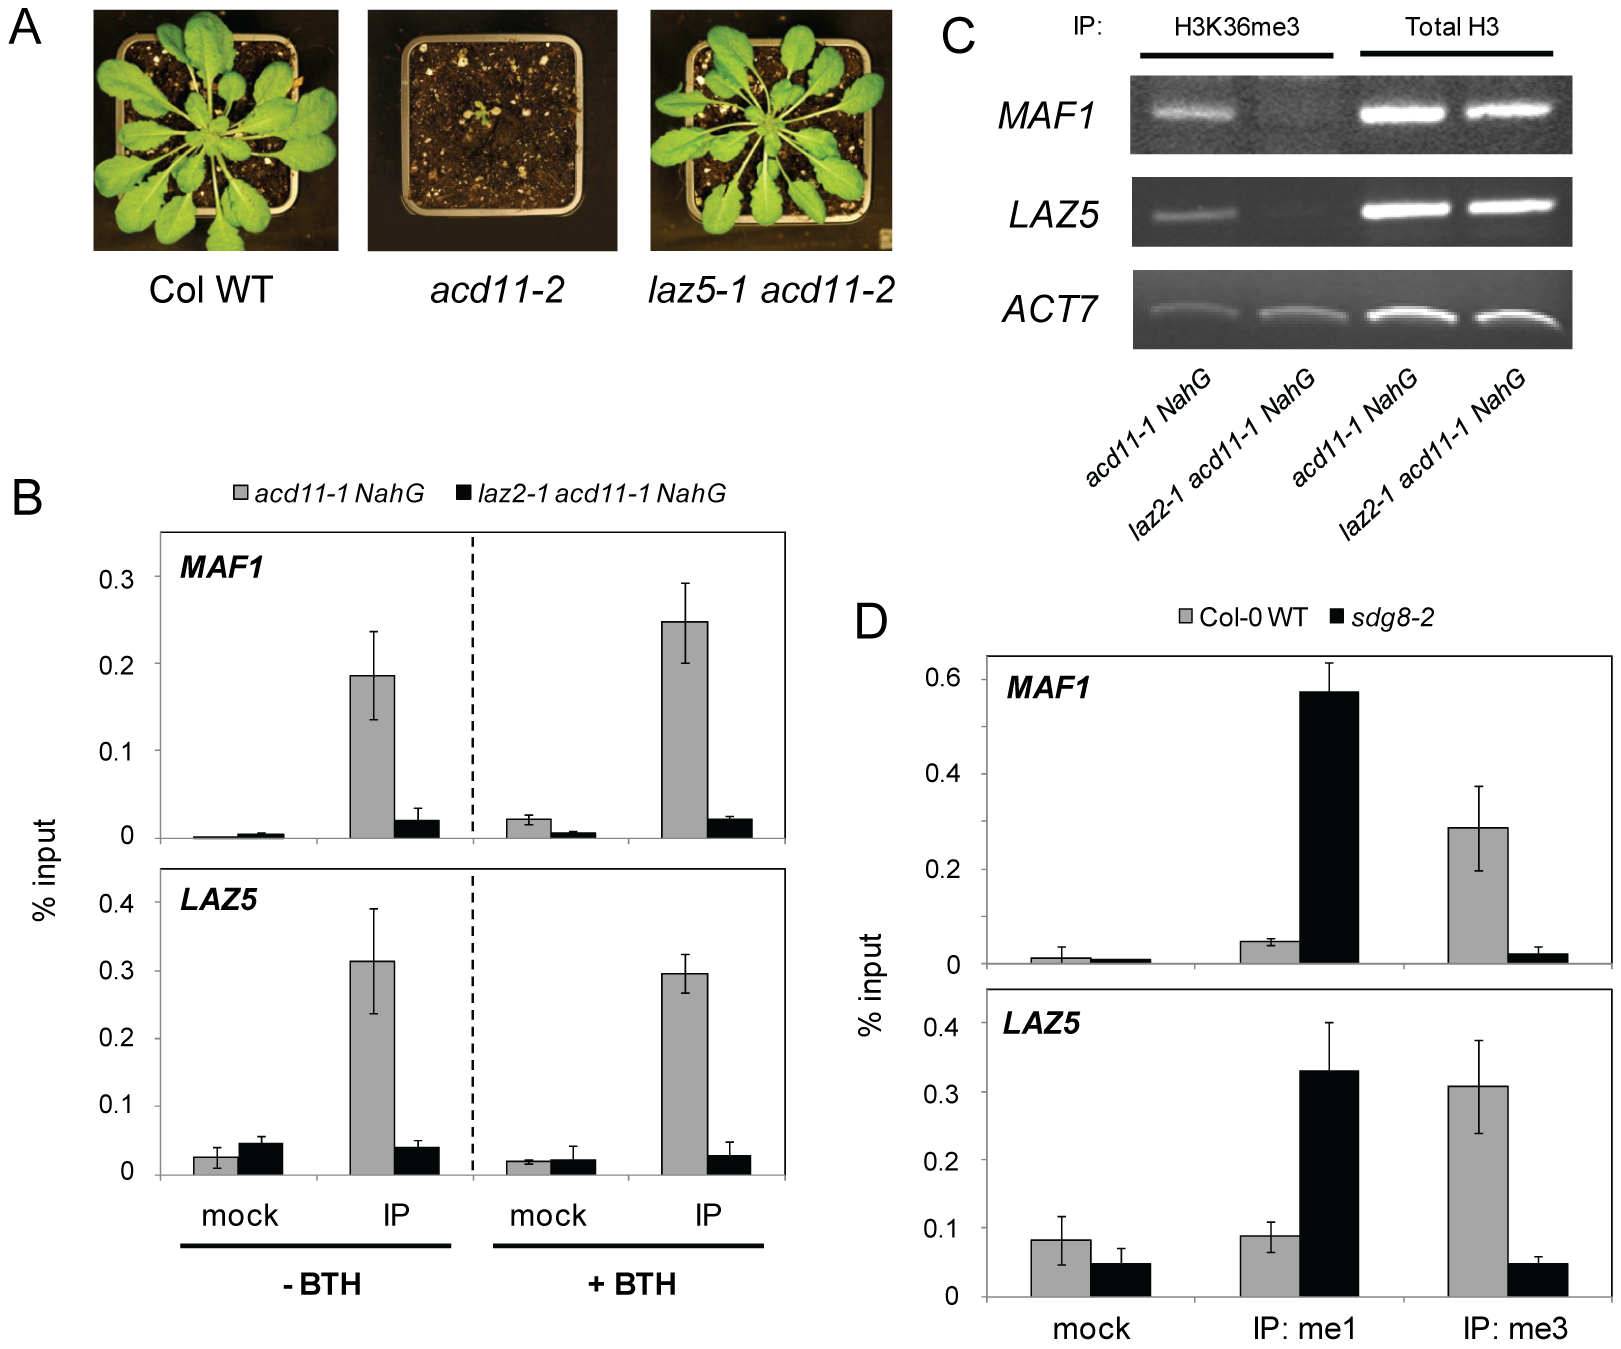 SDG8 regulates LAZ5 and modifies chromatin at the <i>LAZ5</i> locus.